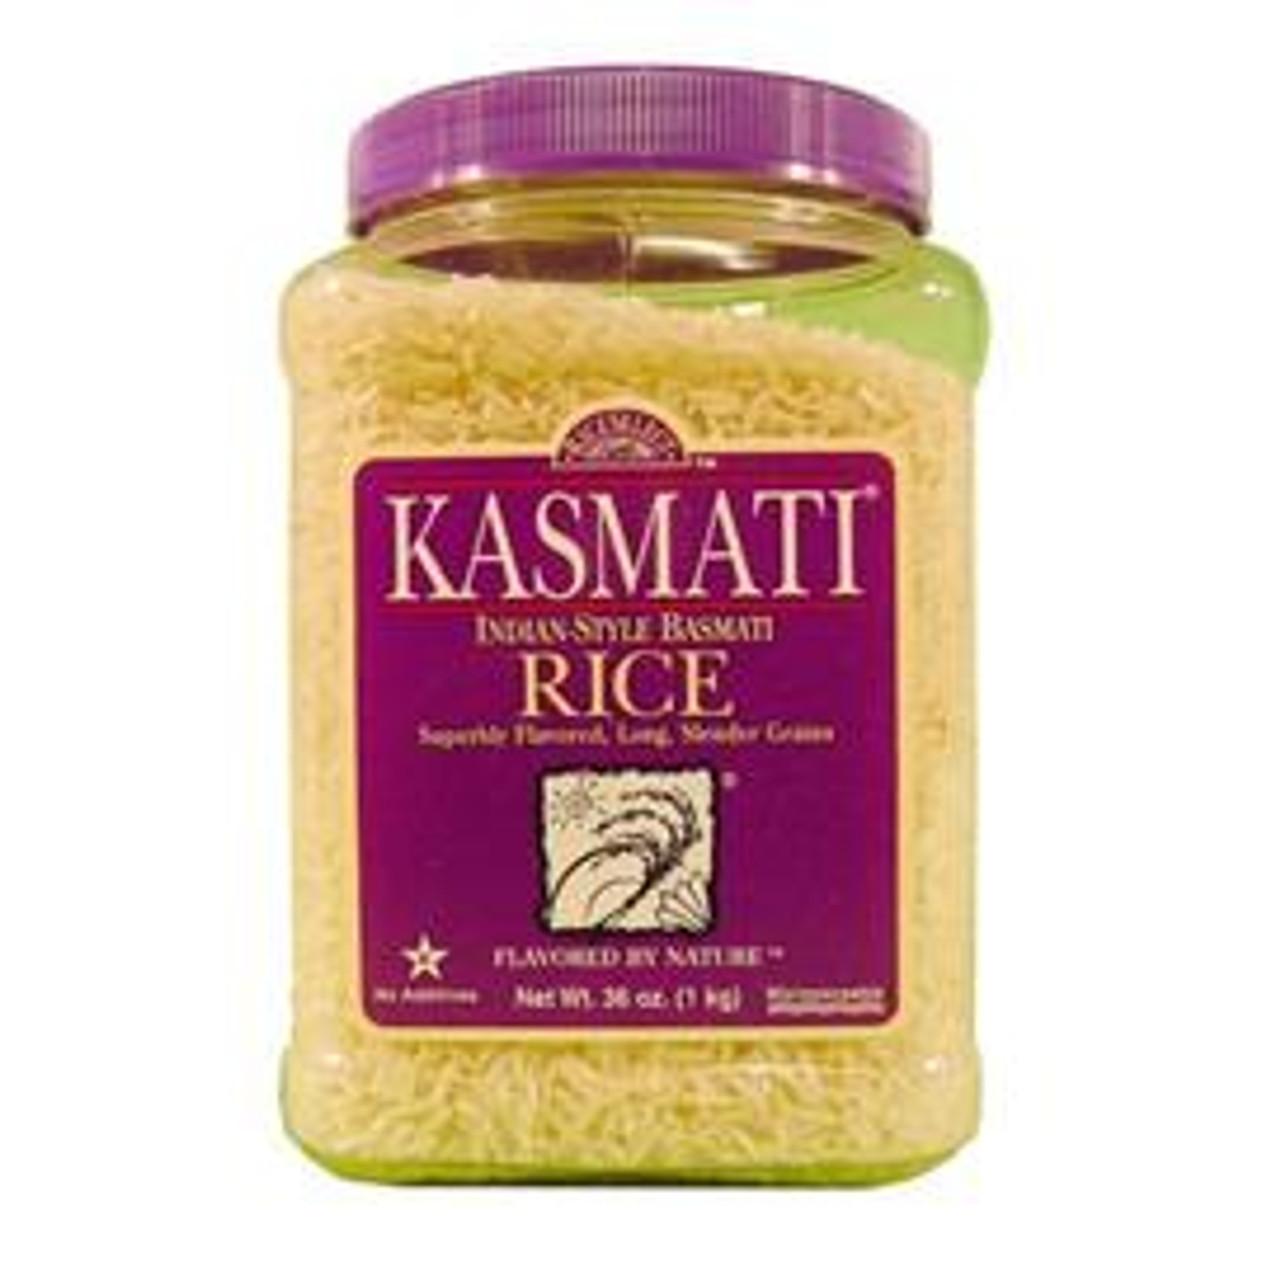 Kasmati Indian Style Basmati Rice